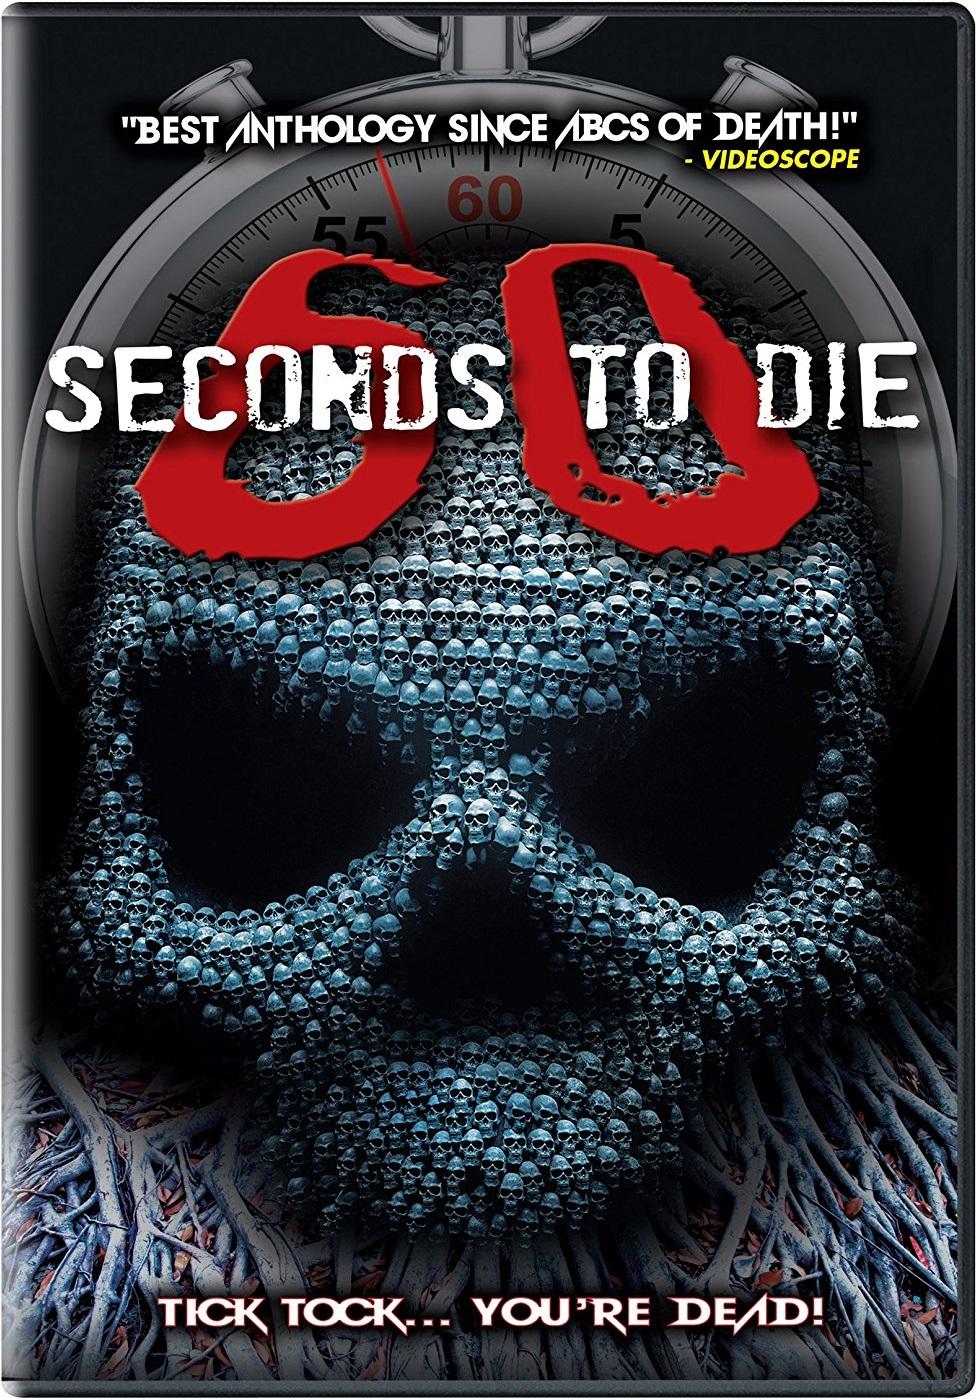 60 Seconds to Di3 (2021) Telugu Dubbed (Voice Over) & English [Dual Audio] WebRip 720p [1XBET]